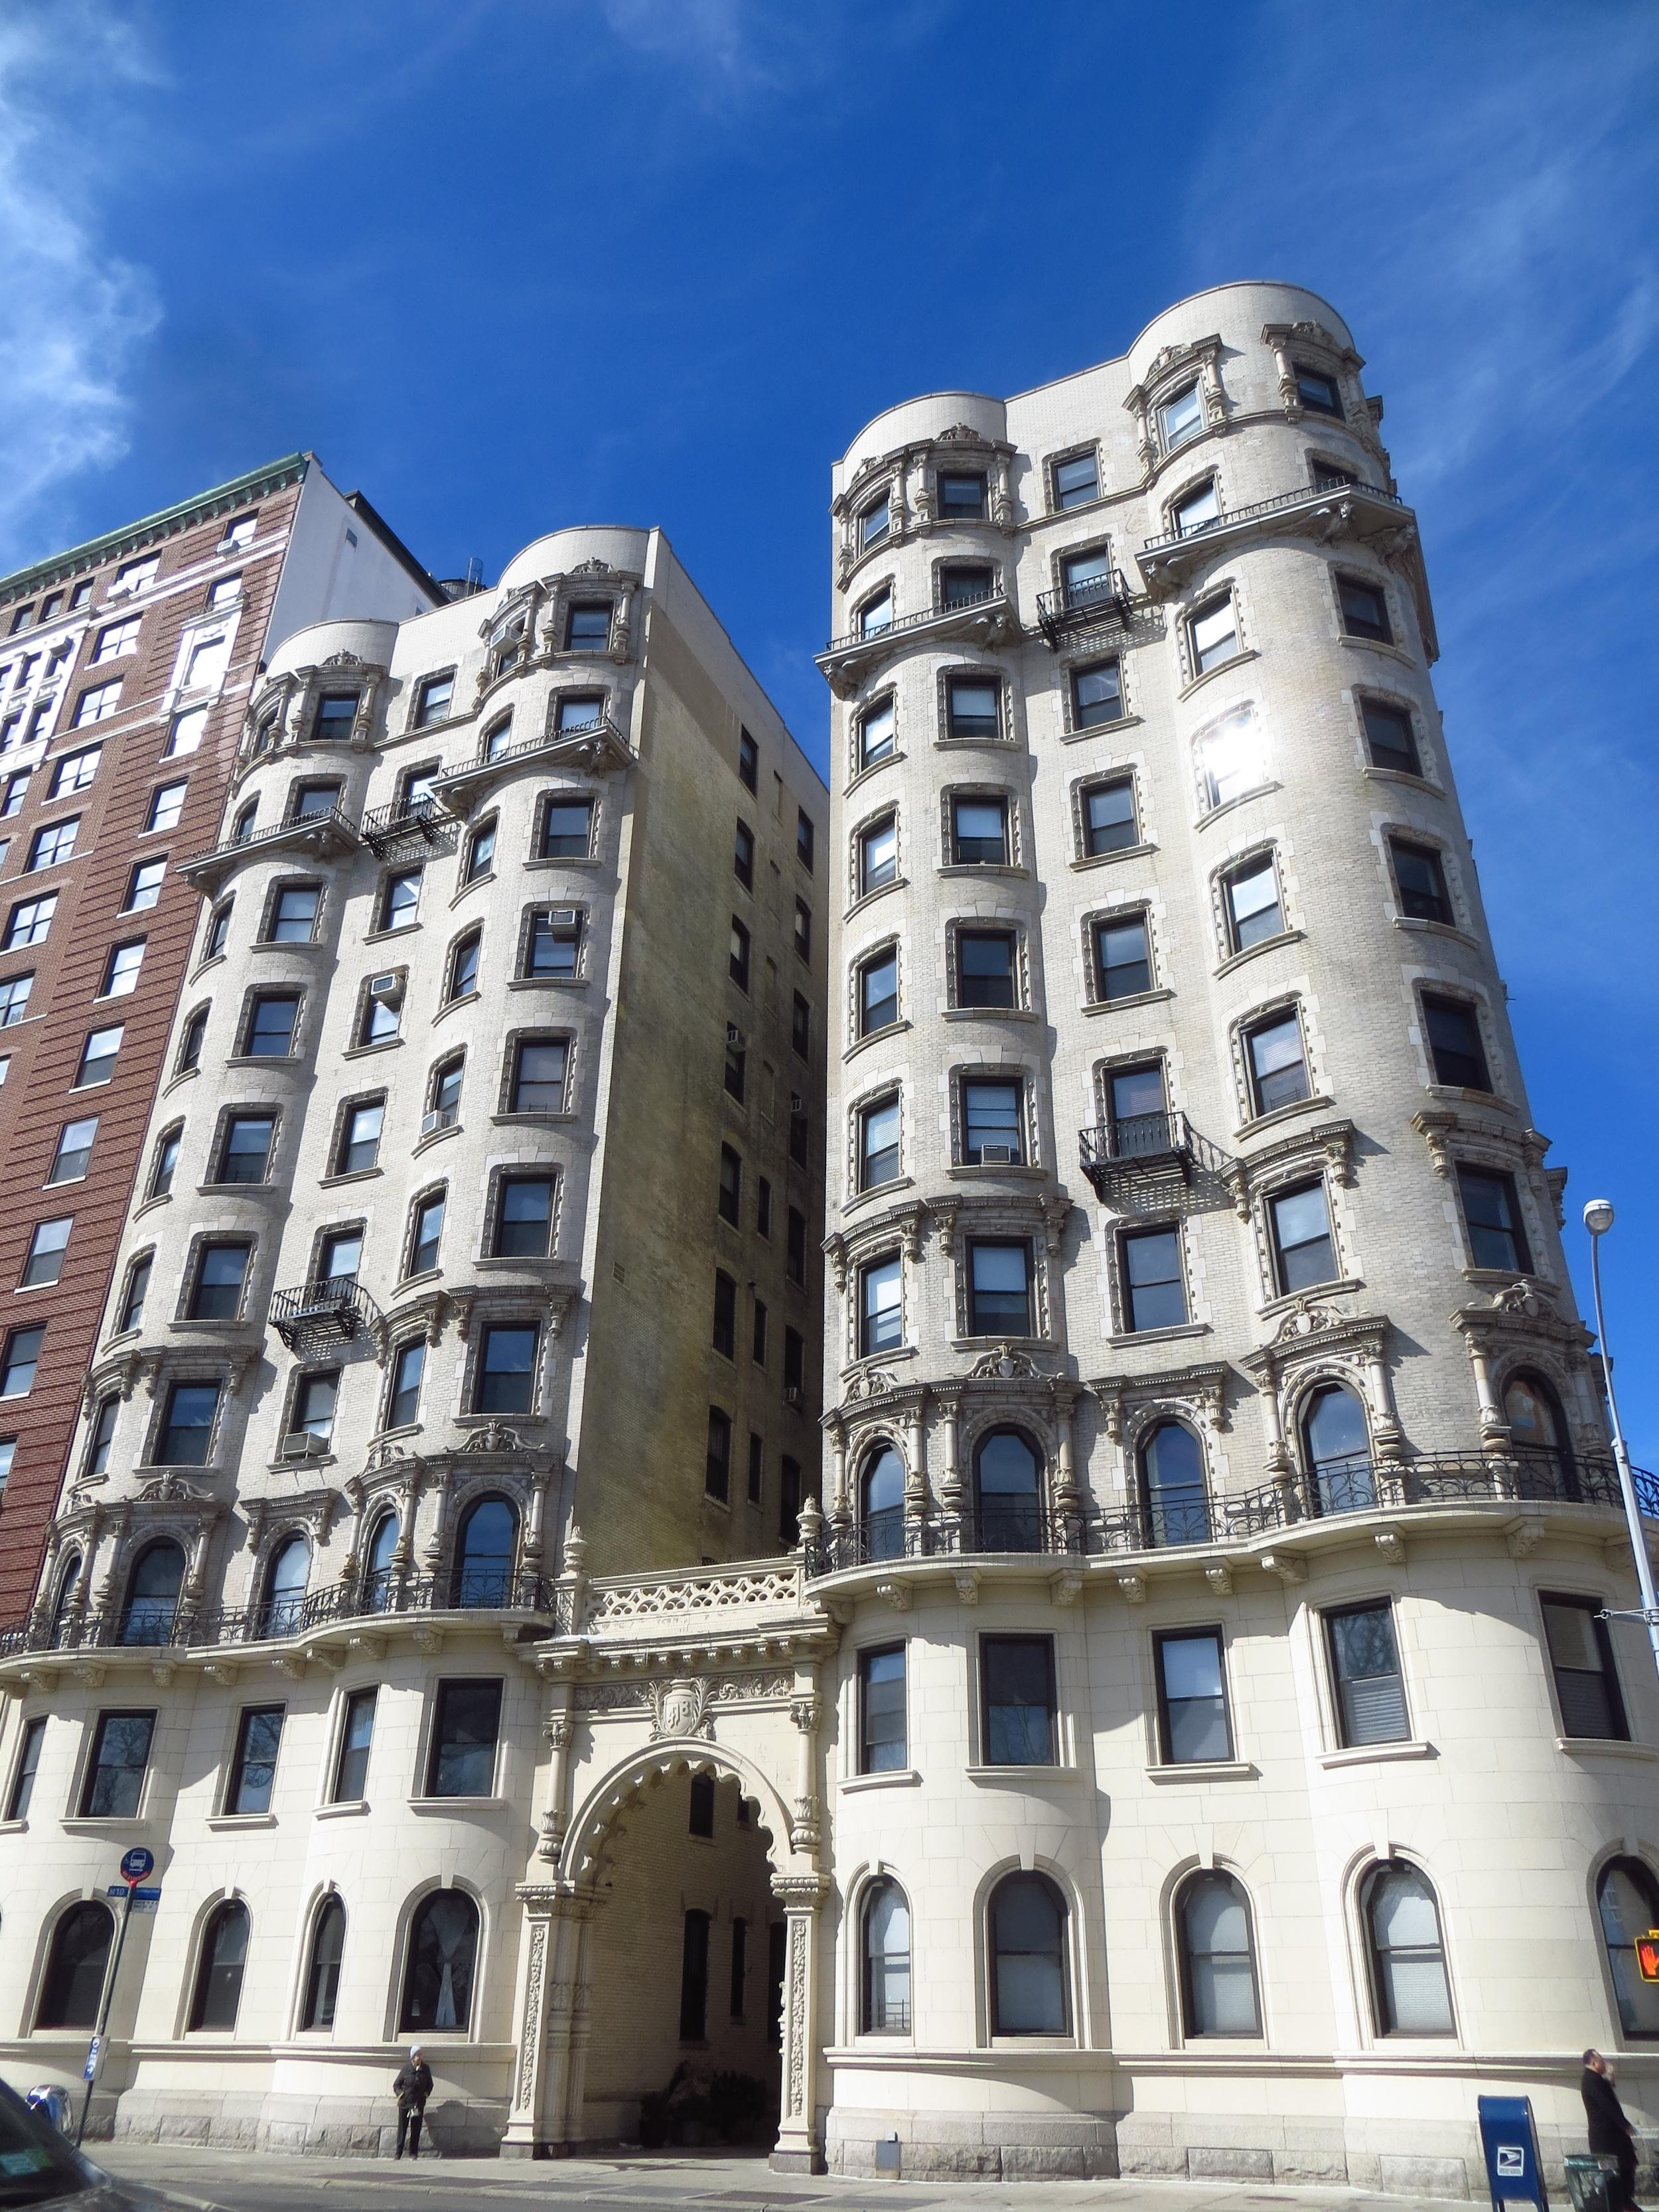 Beautiful apartment building